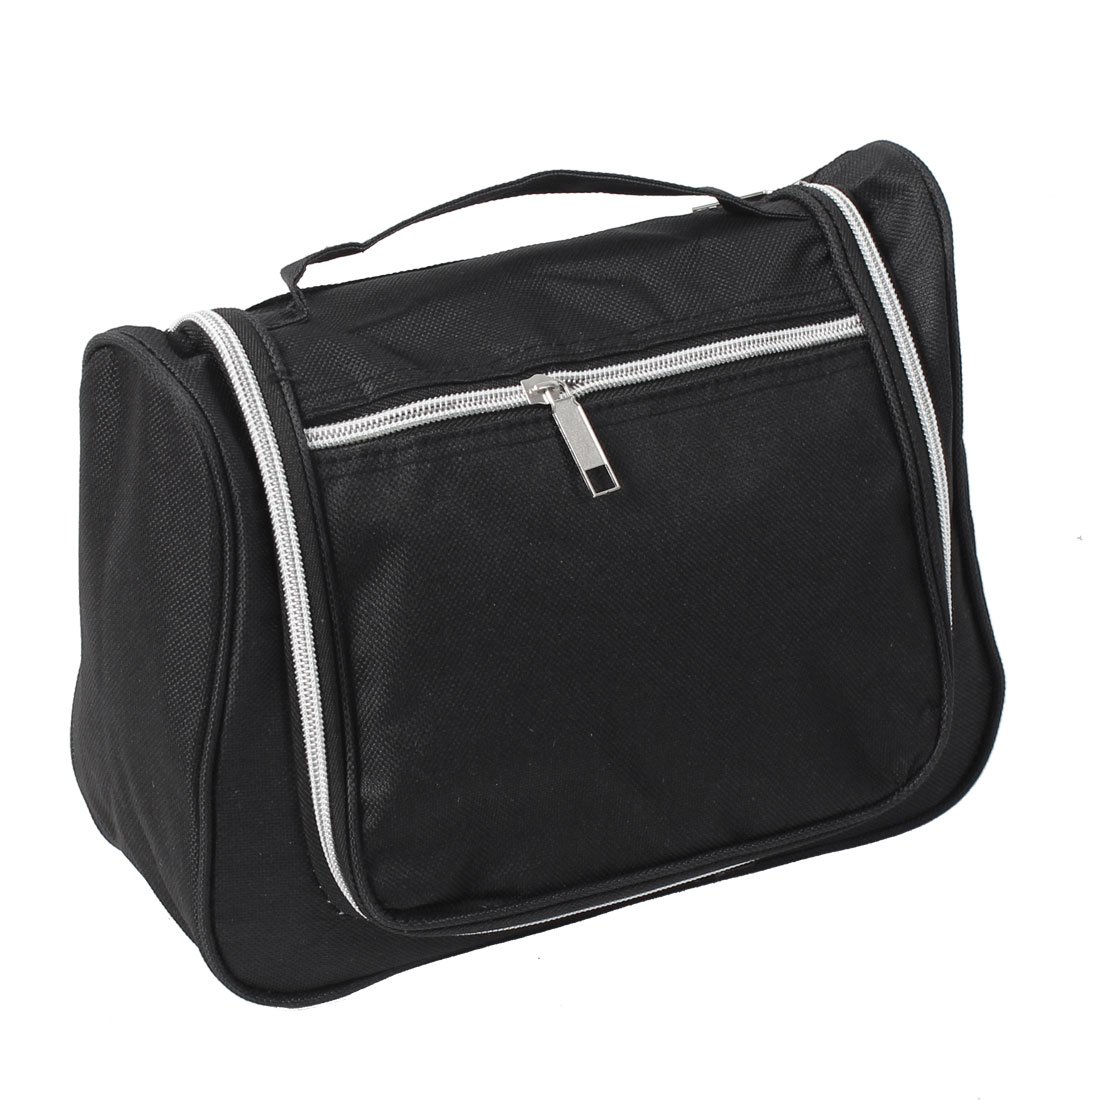 Travel Toiletry Makeup Case Wash Storage Bag Organizer Black